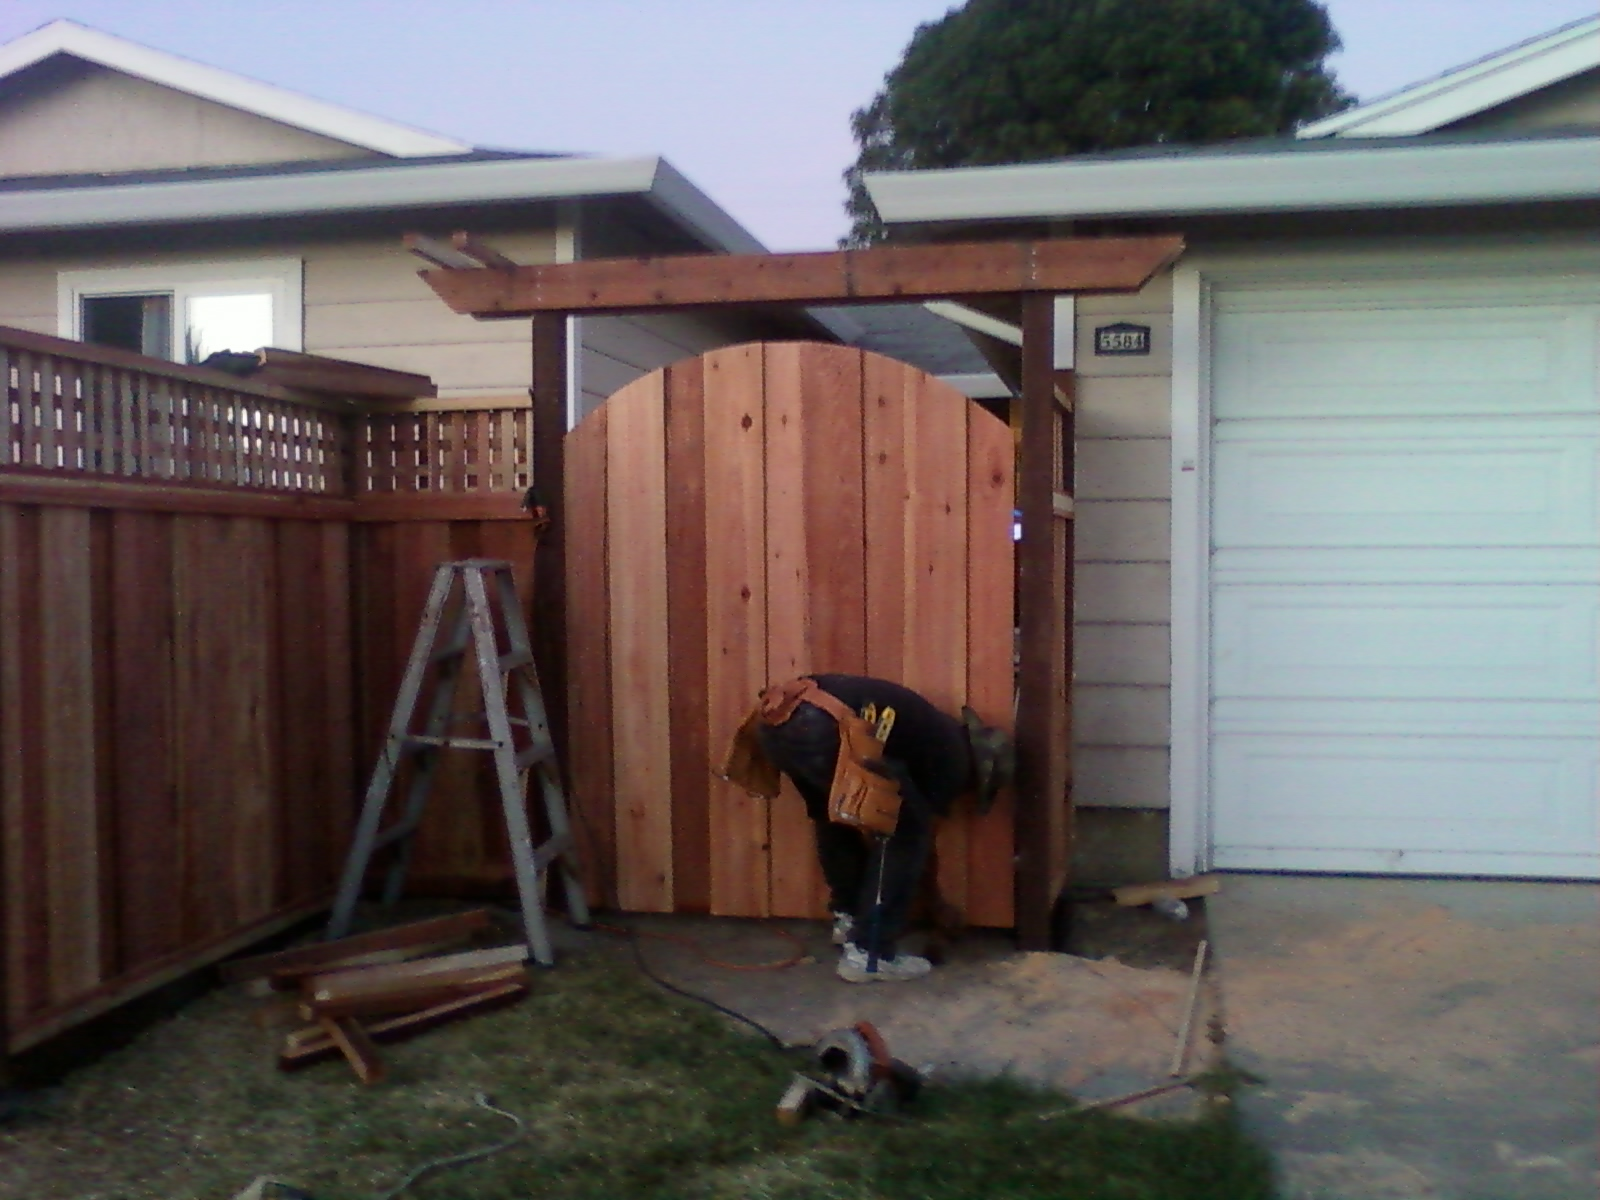 arbors + one single gate